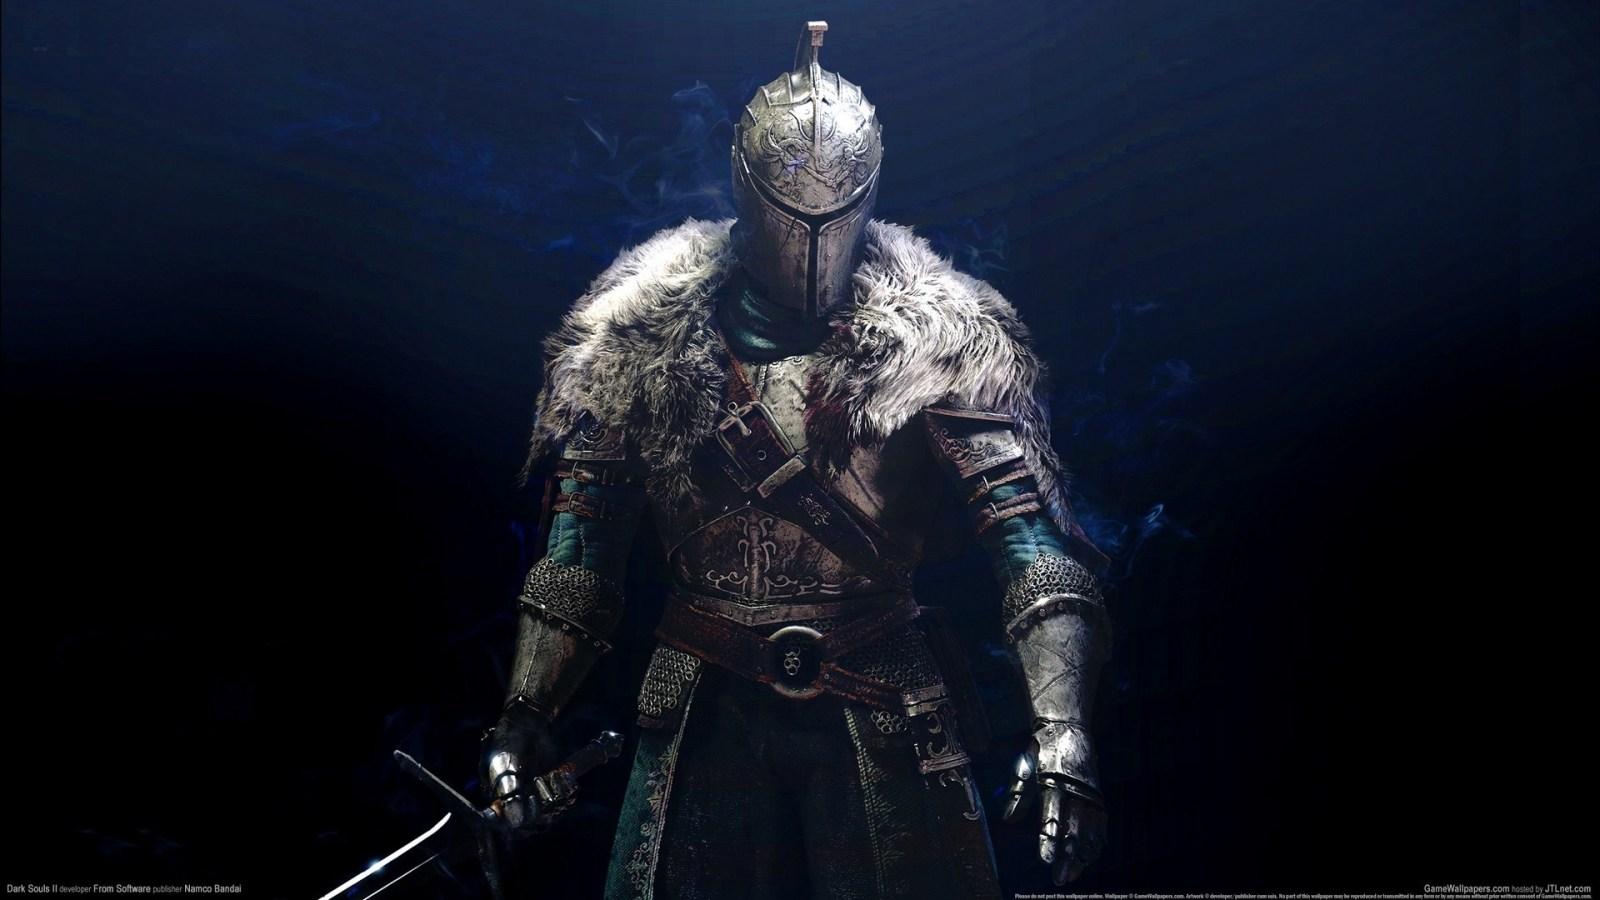 Dark Souls 2 451099 Hd Wallpaper Backgrounds Download